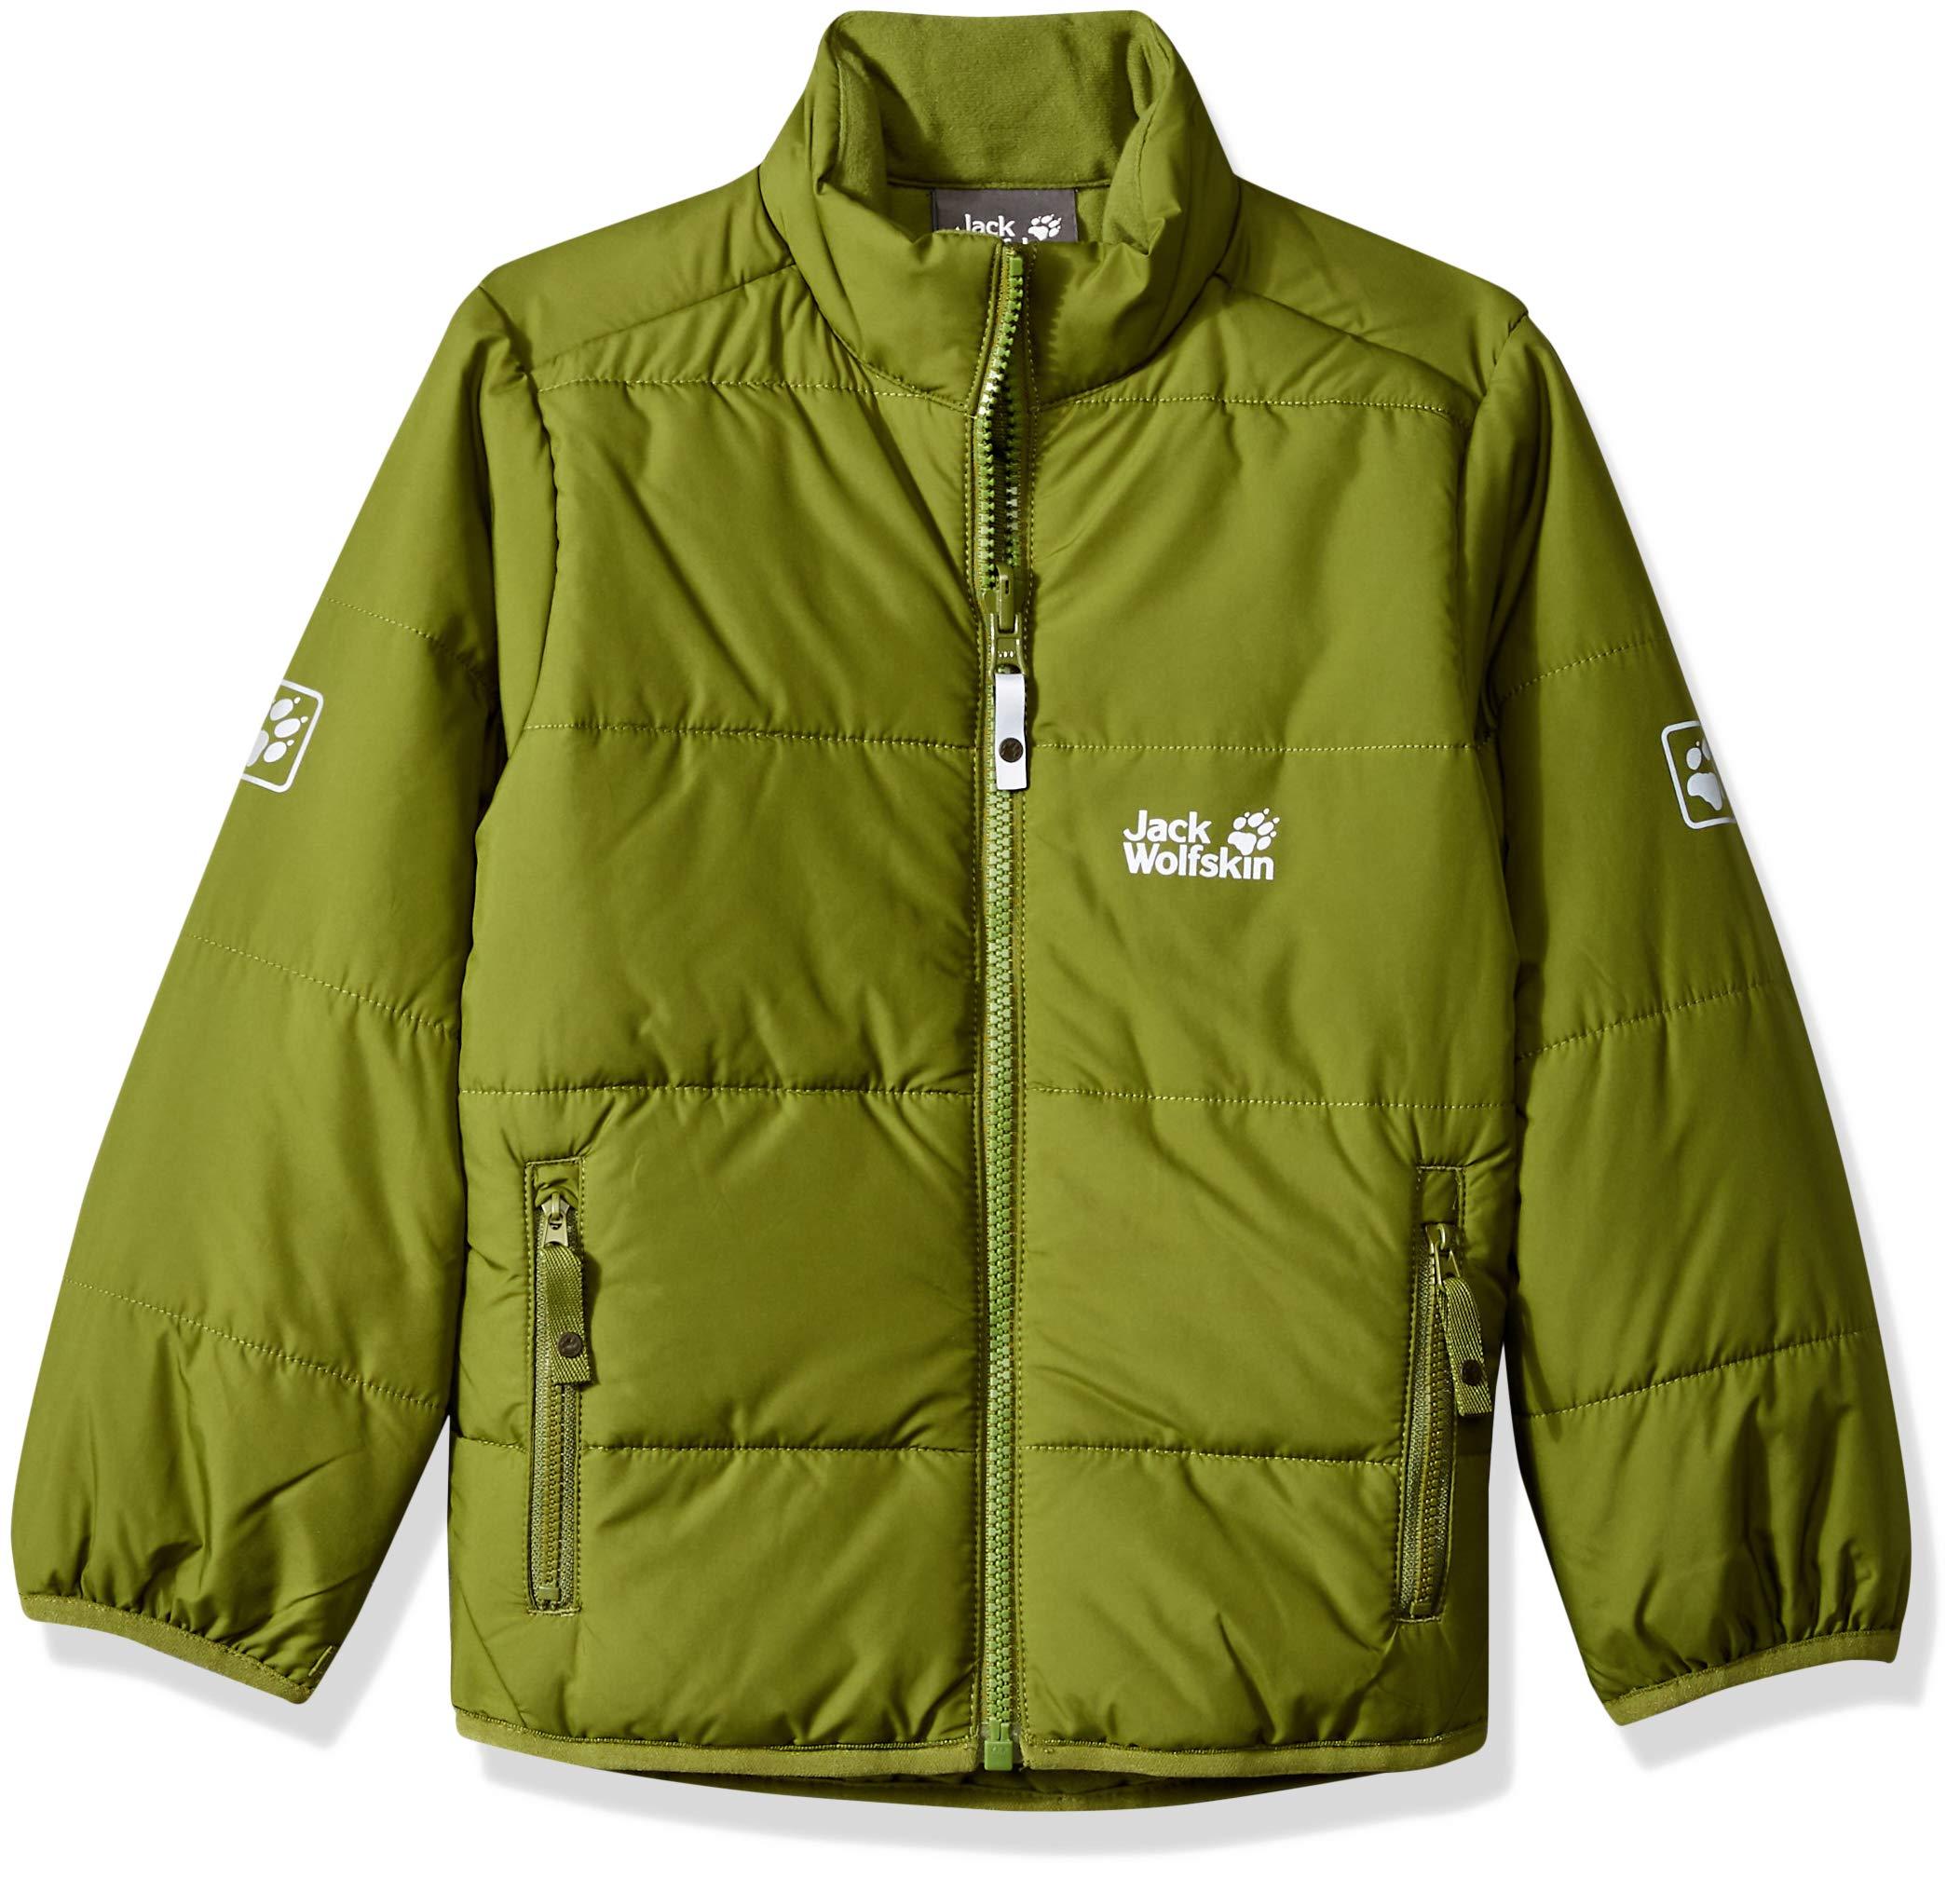 Jack Wolfskin Boy's Kokkola Jacket, Cypress Green, Size92(18-24)